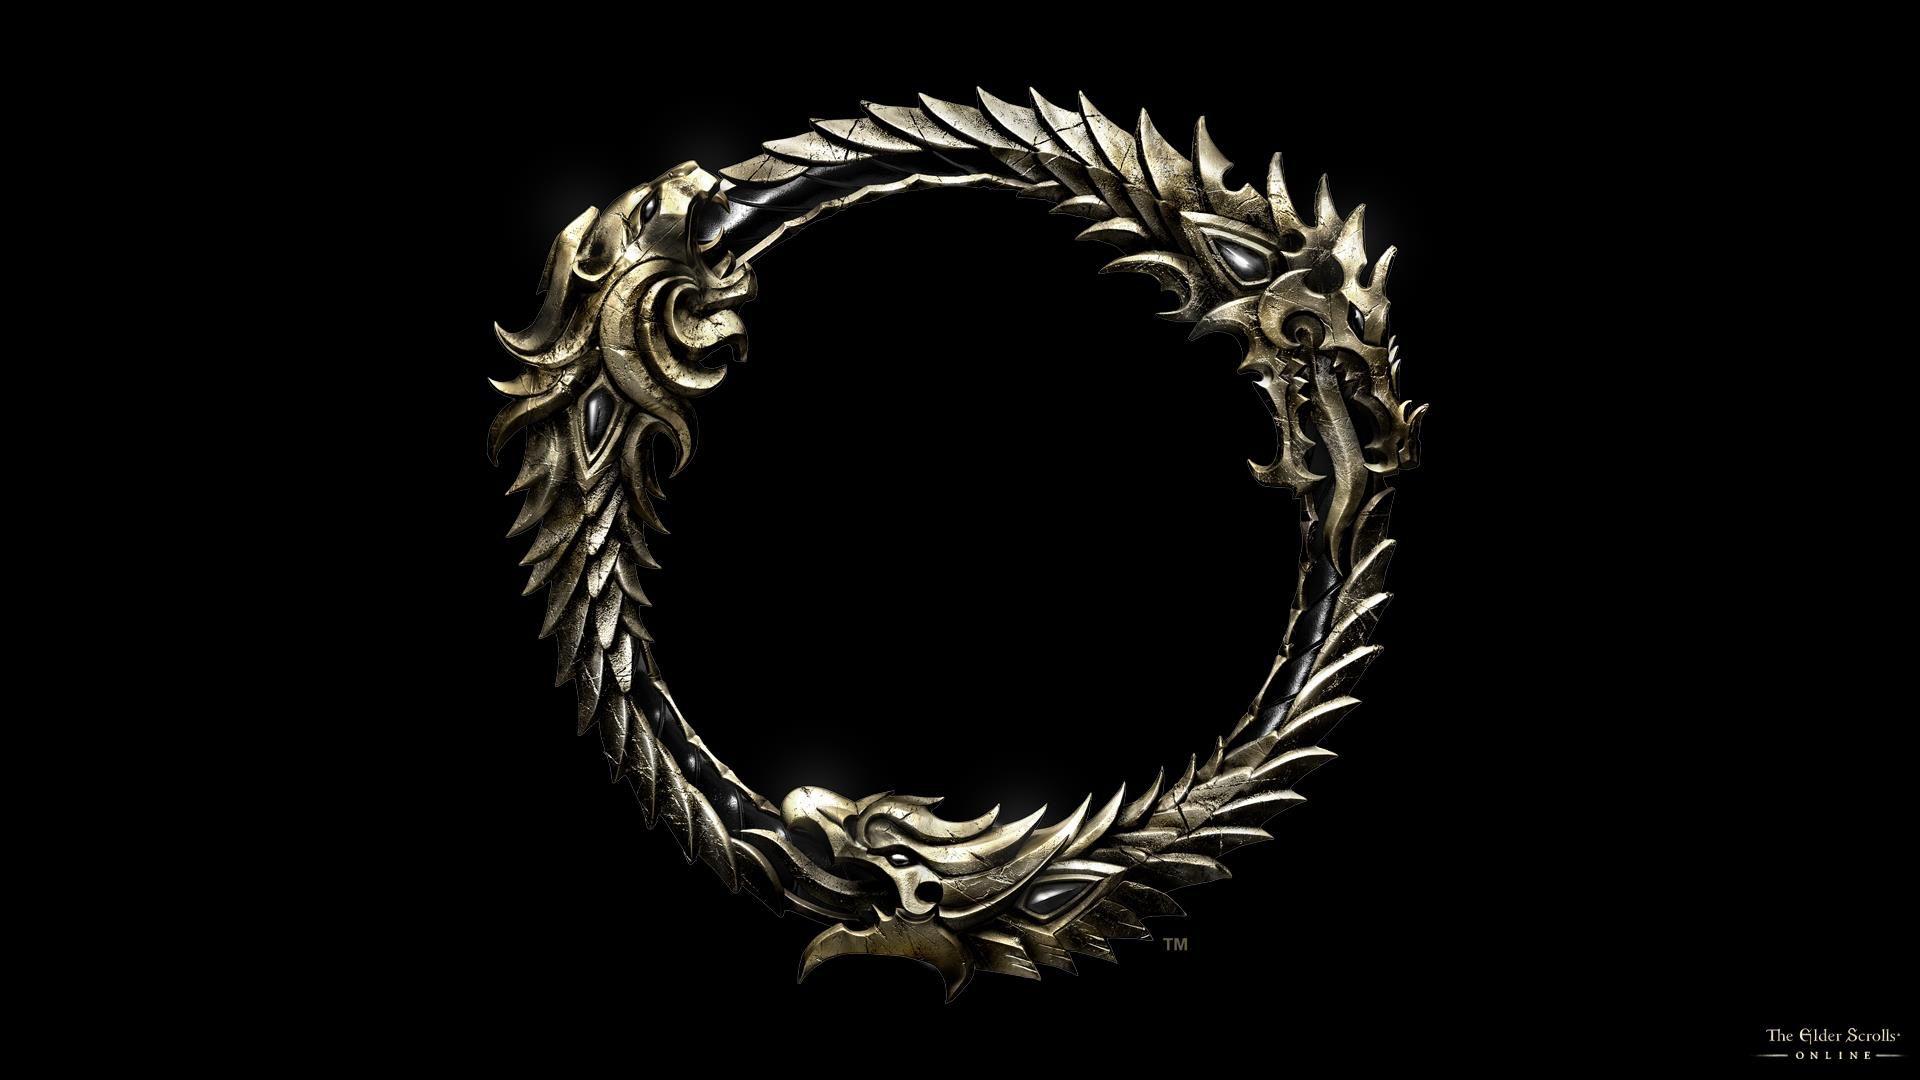 Elder Scrolls symbol Elder scrolls online, Elder scrolls